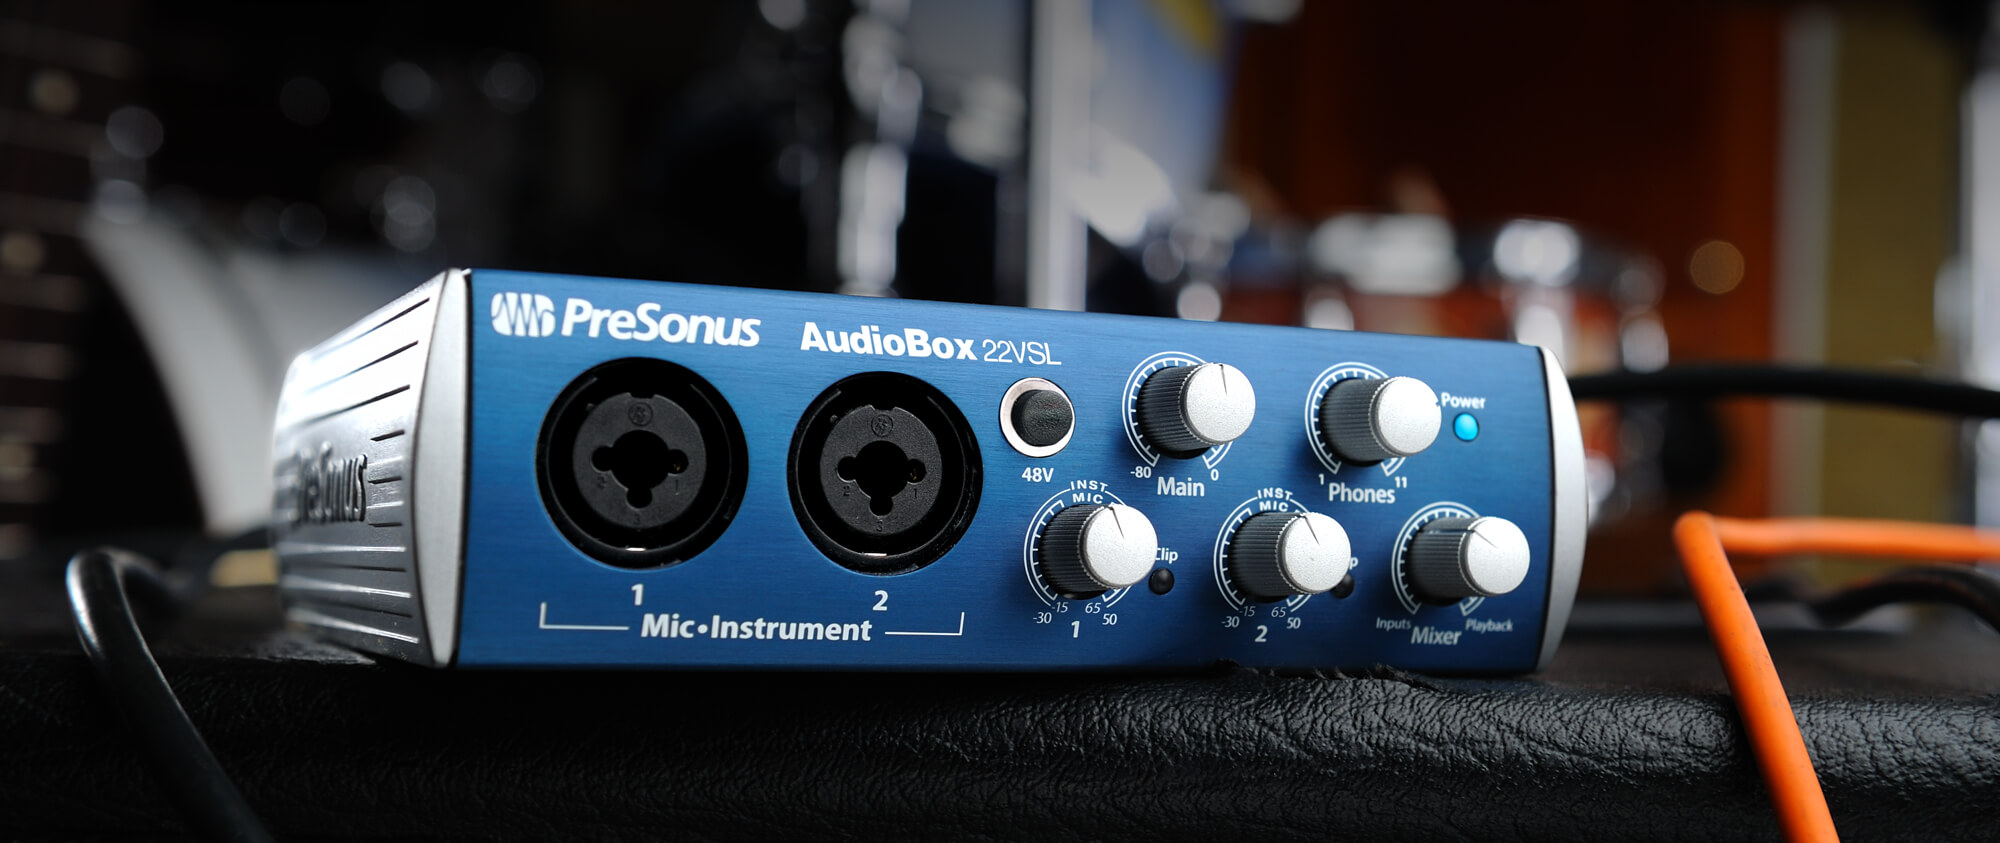 AudioBox 22VSL | Downloads | PreSonus